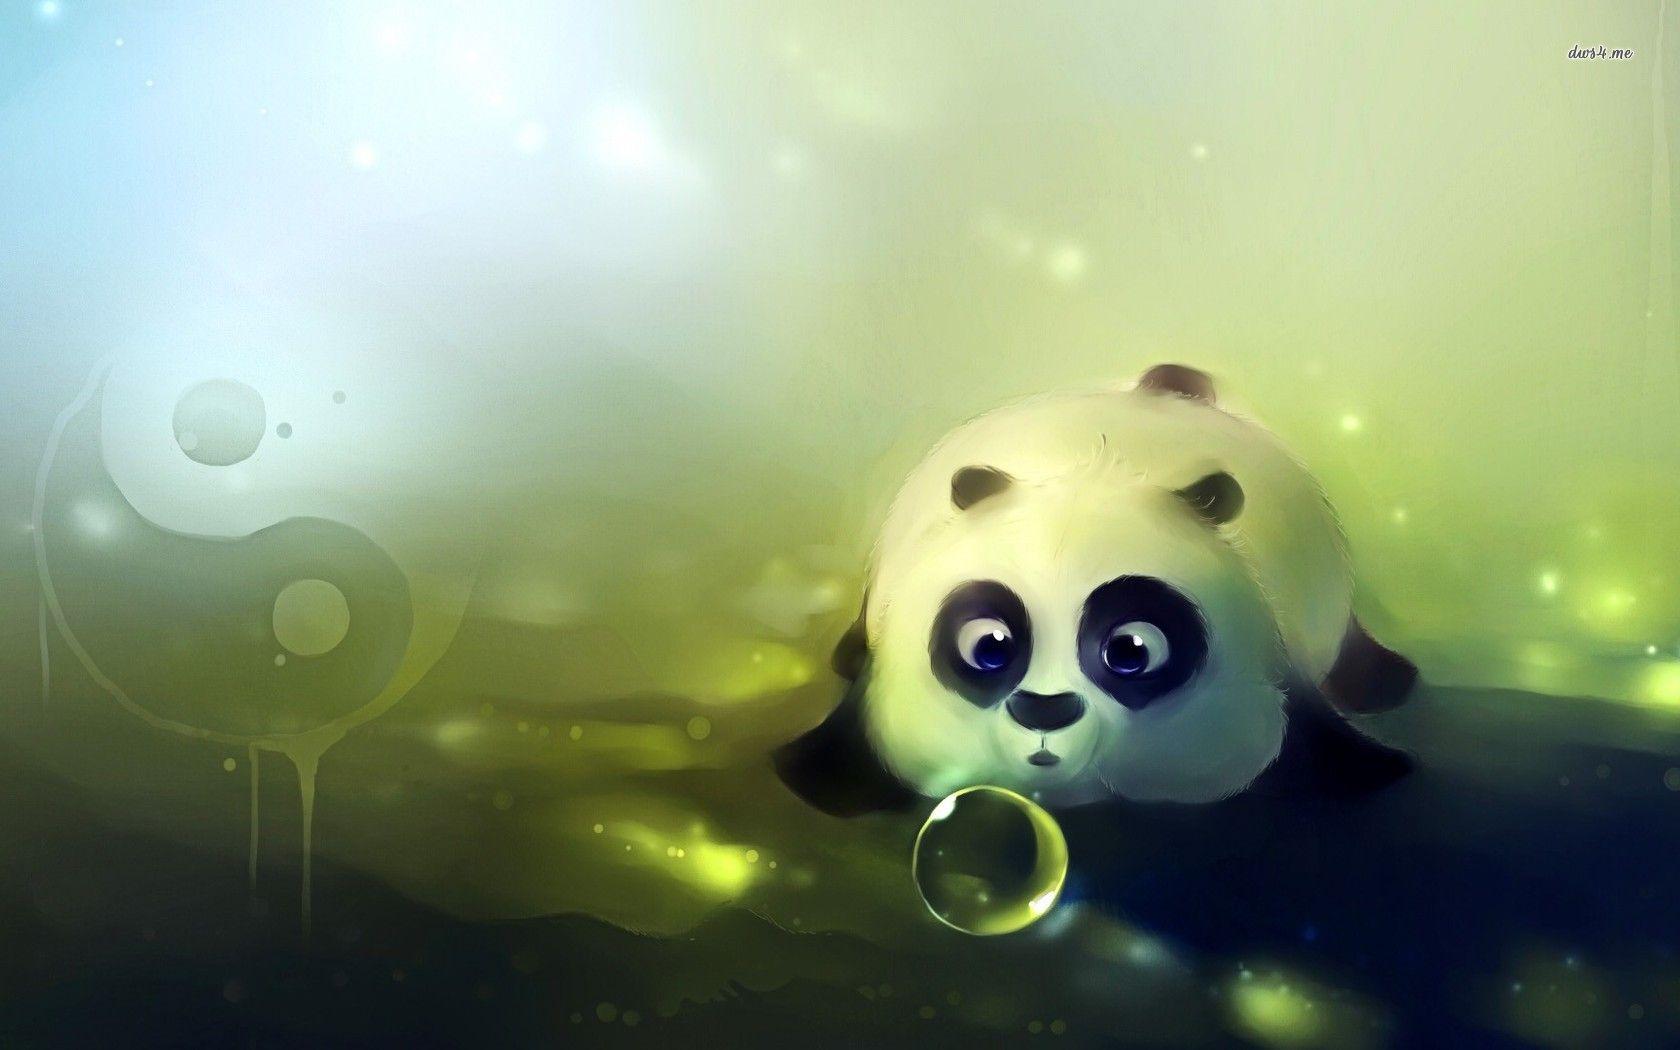 Panda anime awesome wallpapers 9520 amazing wallpaperz - Panda anime wallpaper ...